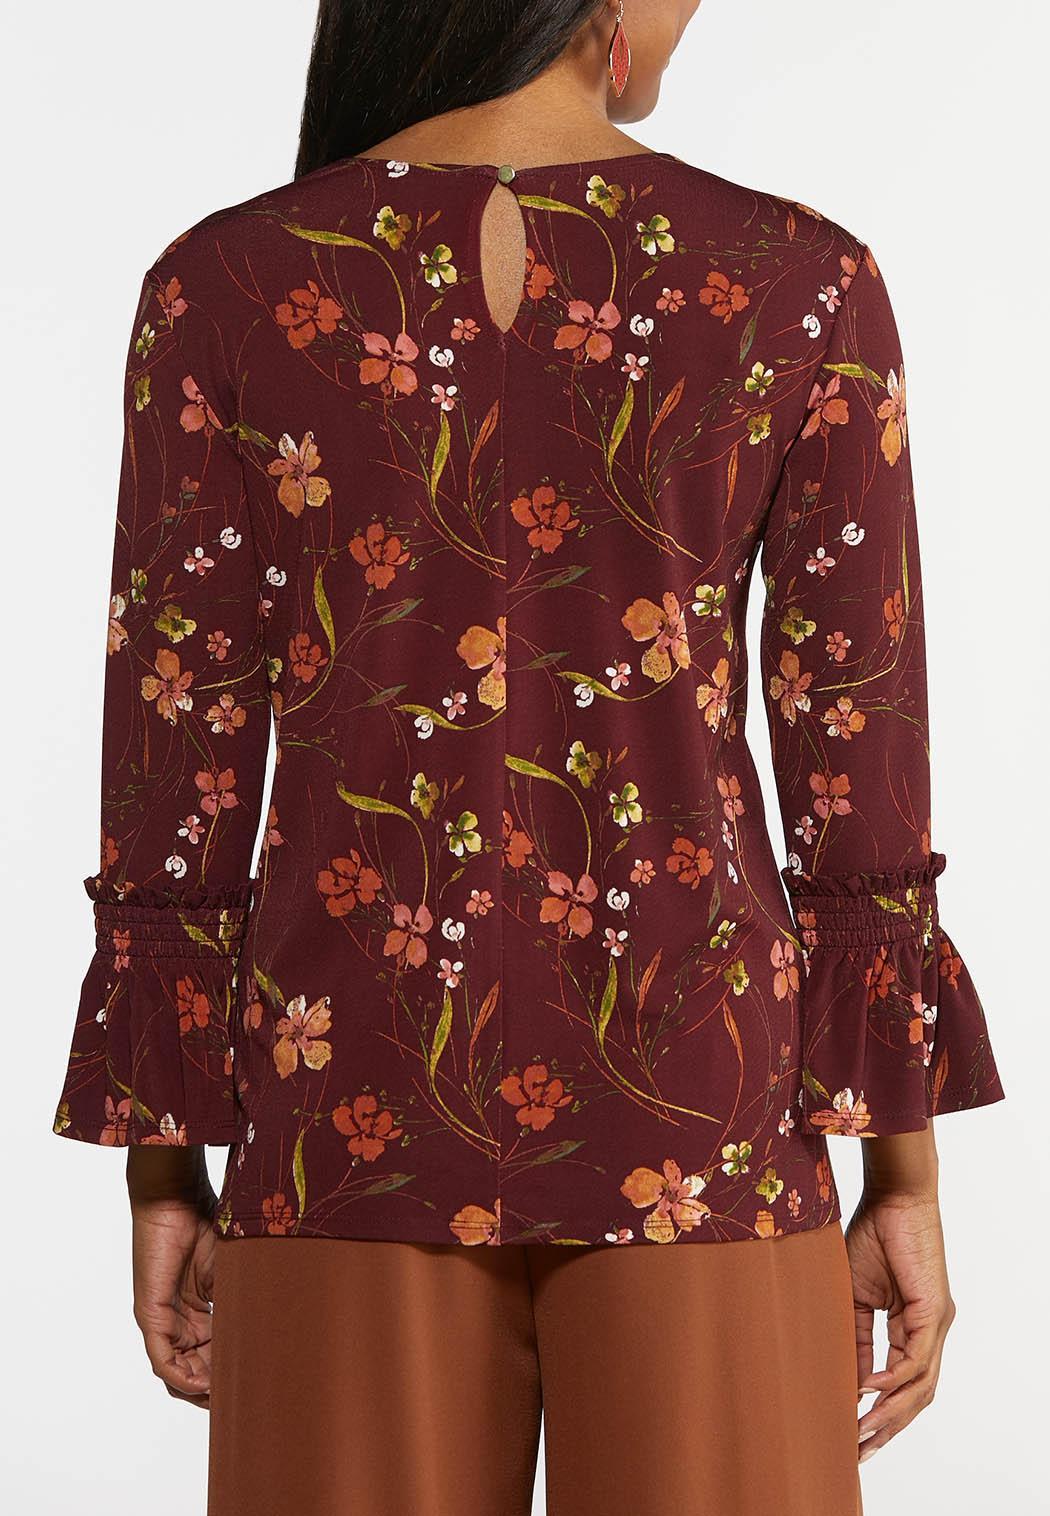 Plus Size Wine Floral Top (Item #44367399)